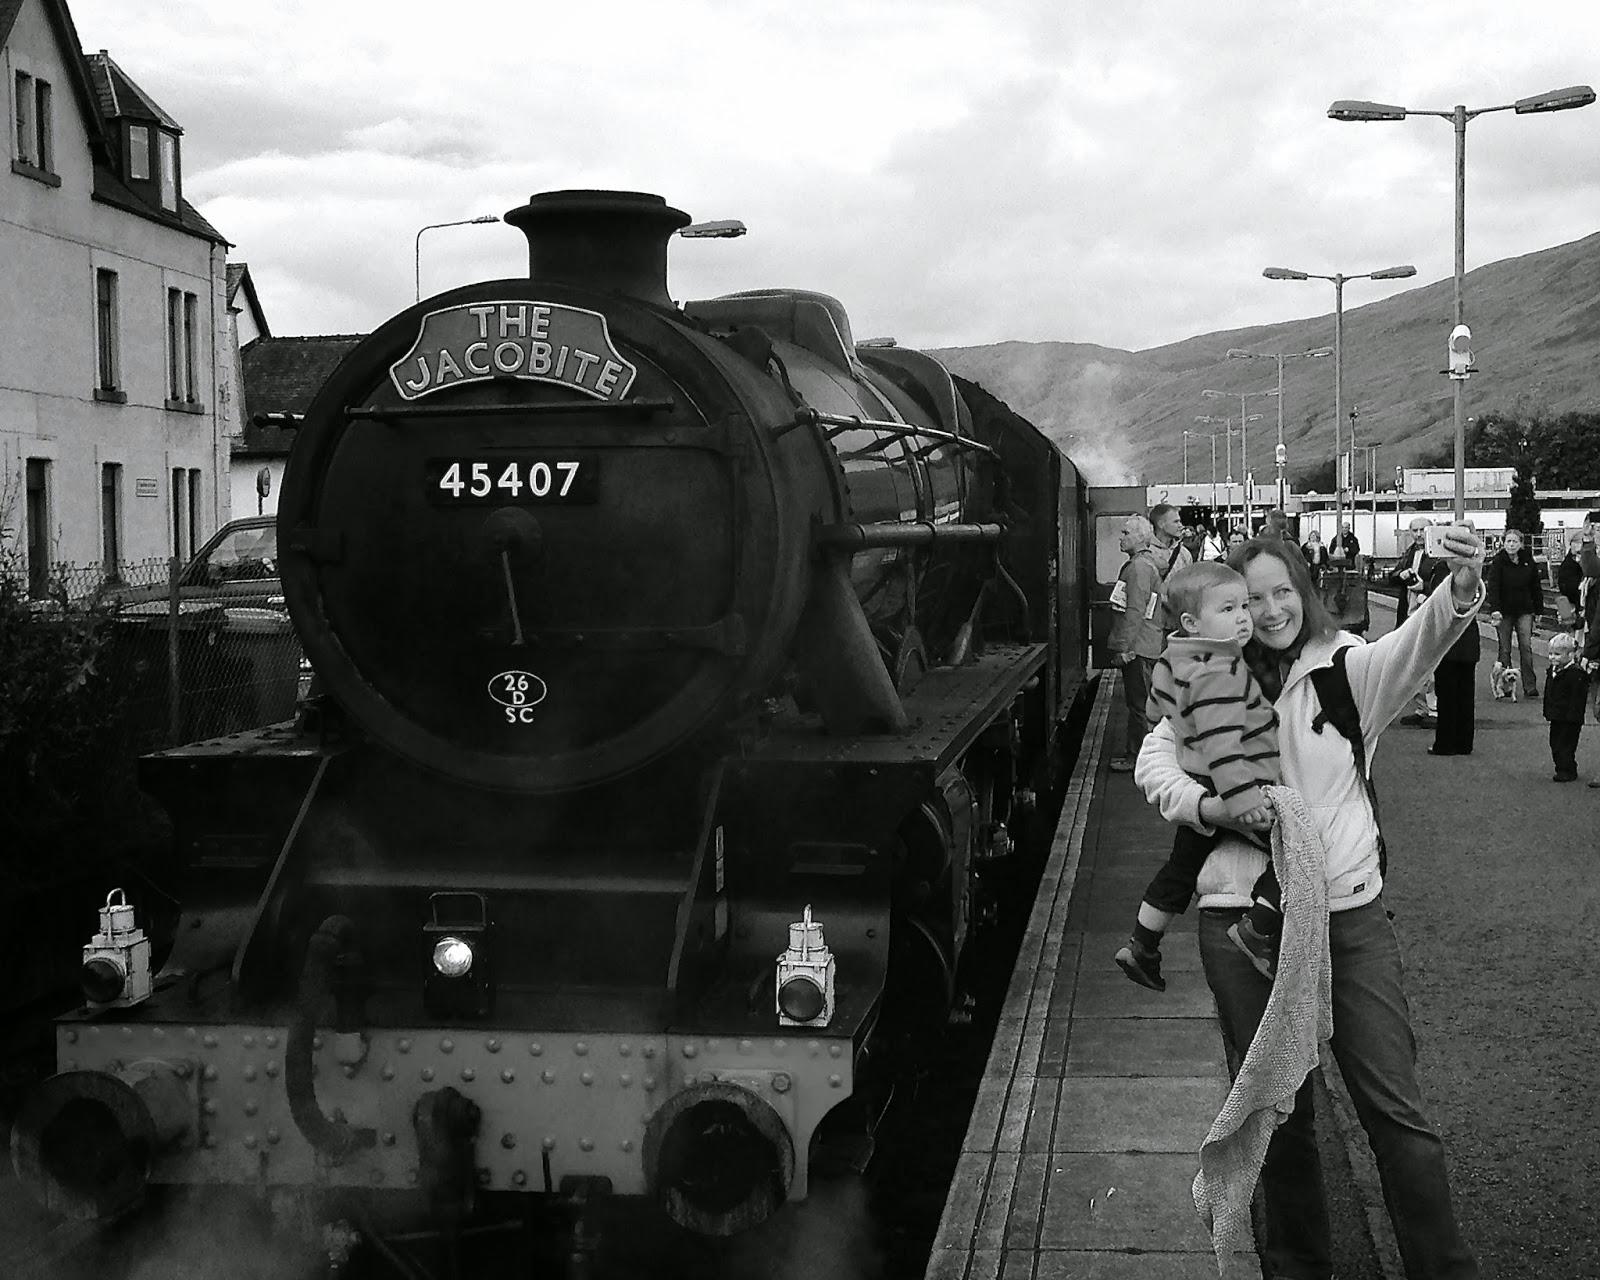 Selfie with a steam train